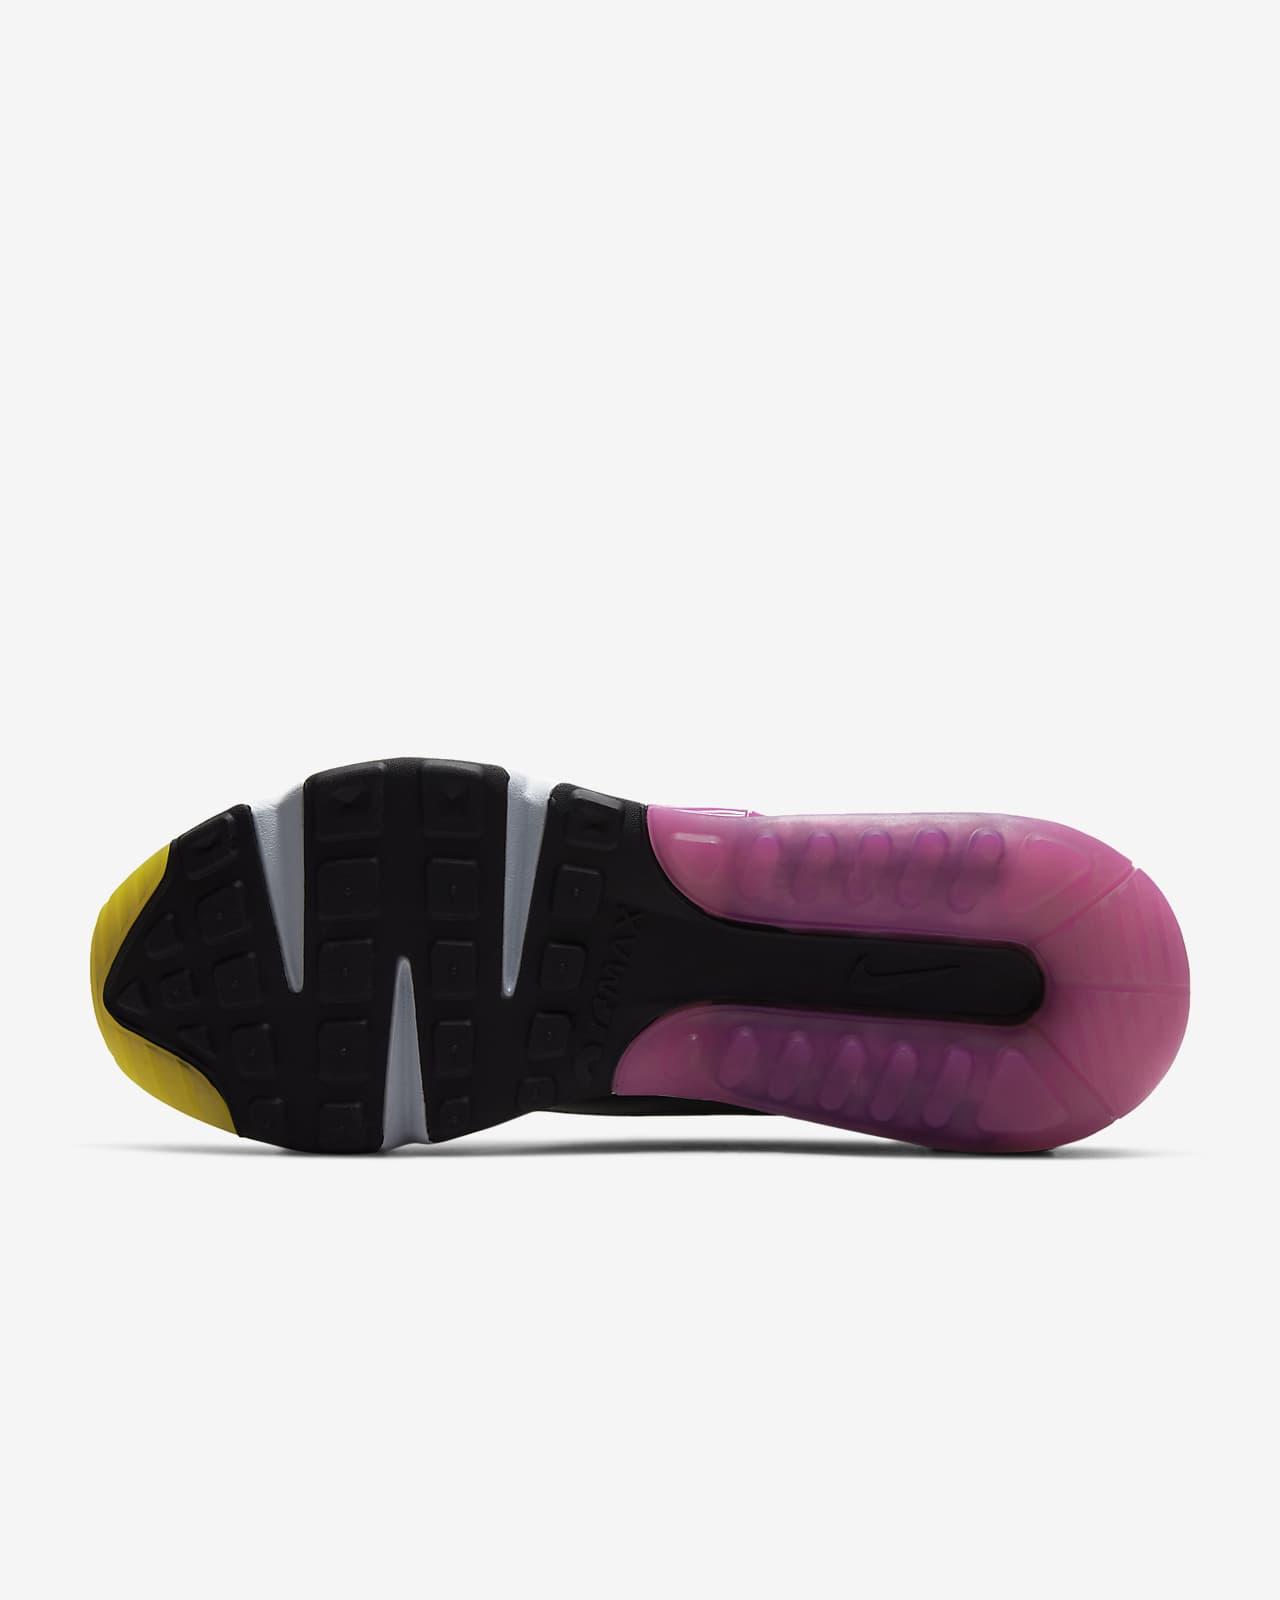 nike air max zapatos hombres ct7695-401